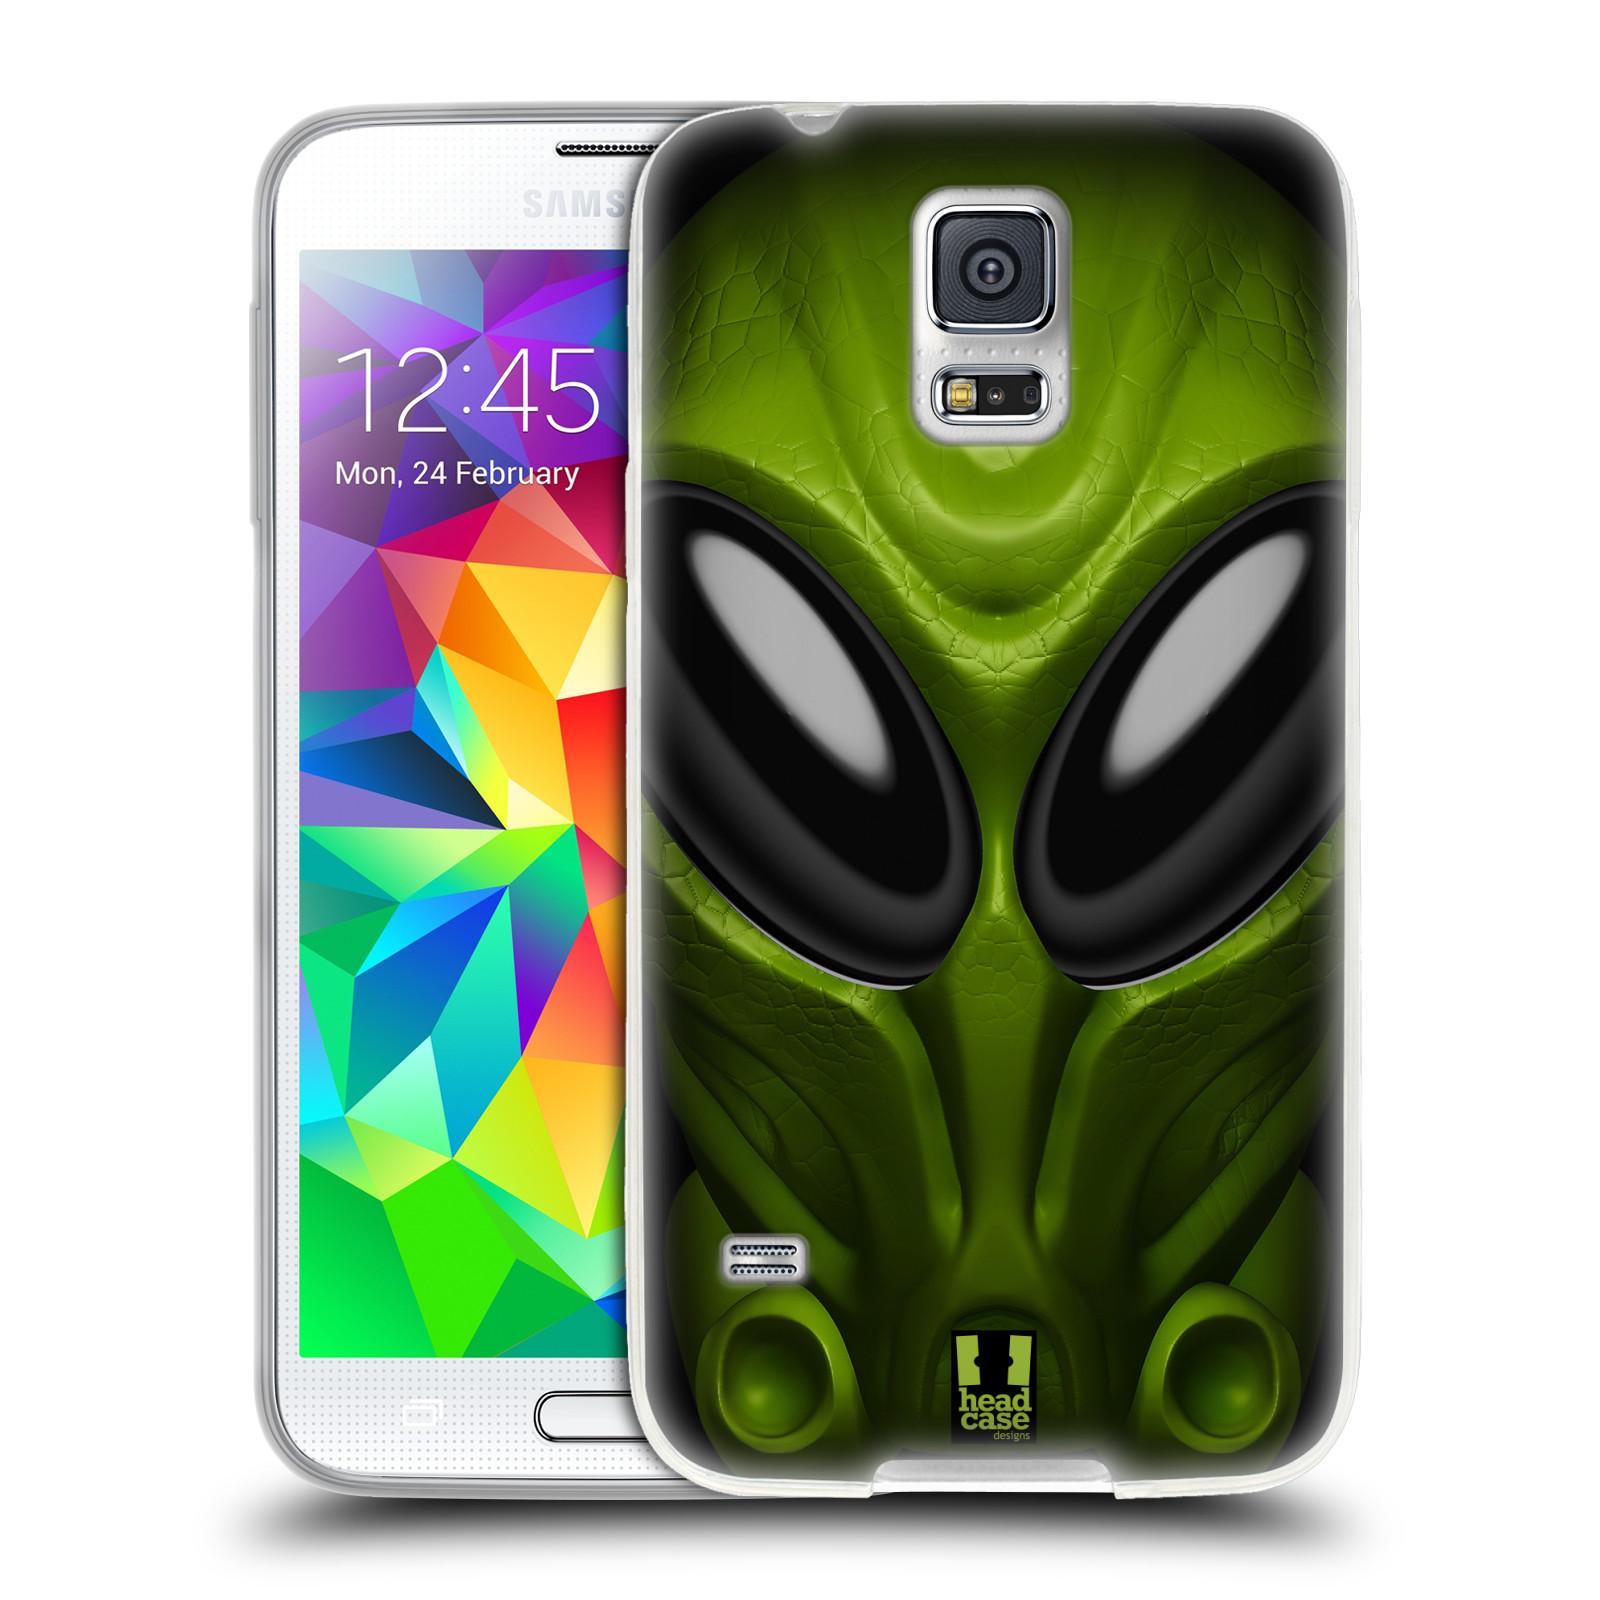 Silikonové pouzdro na mobil Samsung Galaxy S5 Neo - Head Case - Ufoun Mastermind